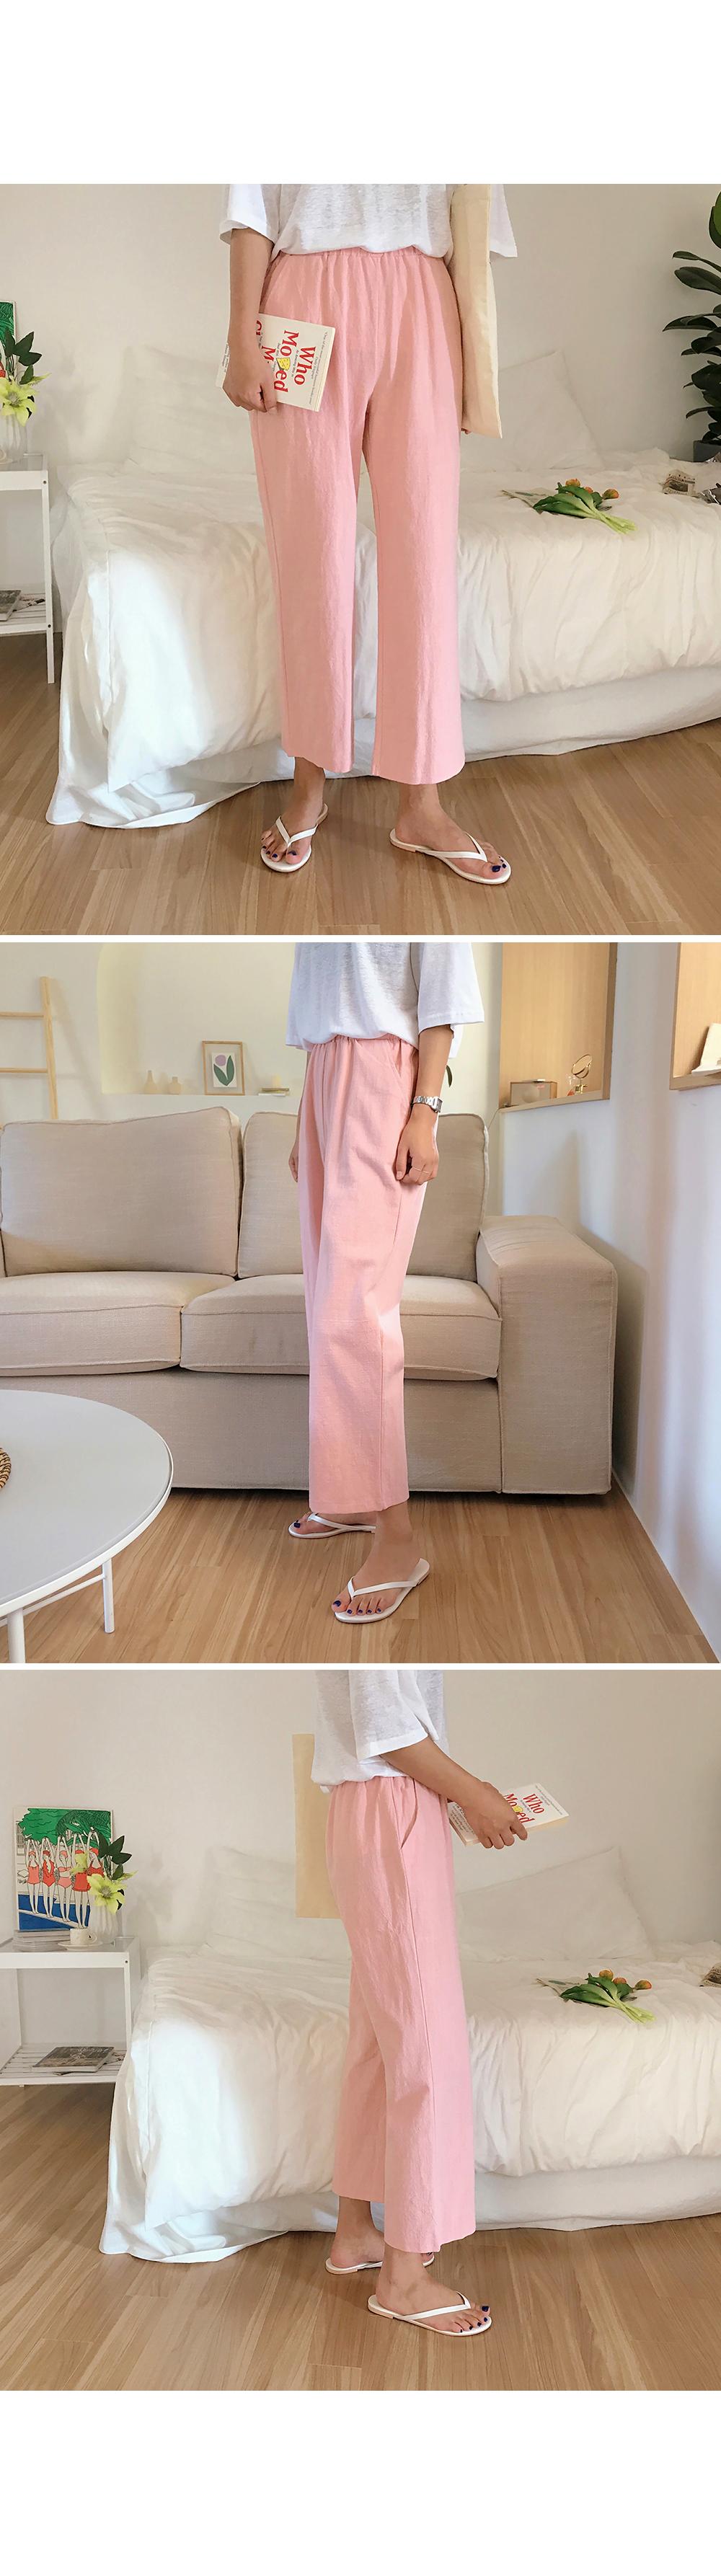 Pink Casual Linen Pants-holiholic.com